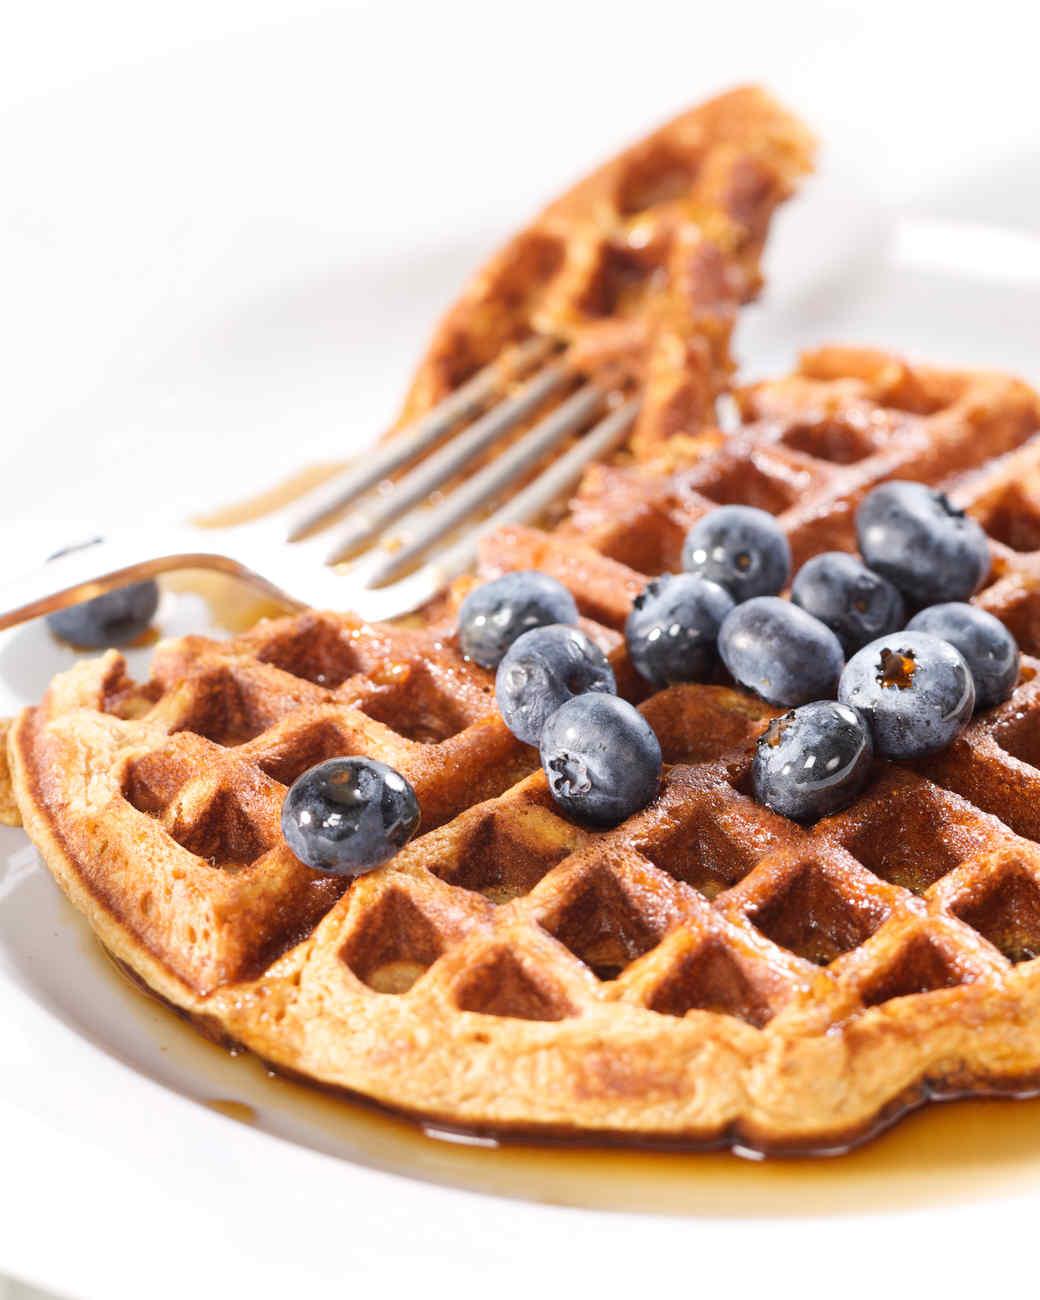 4137_051409_waffles.jpg